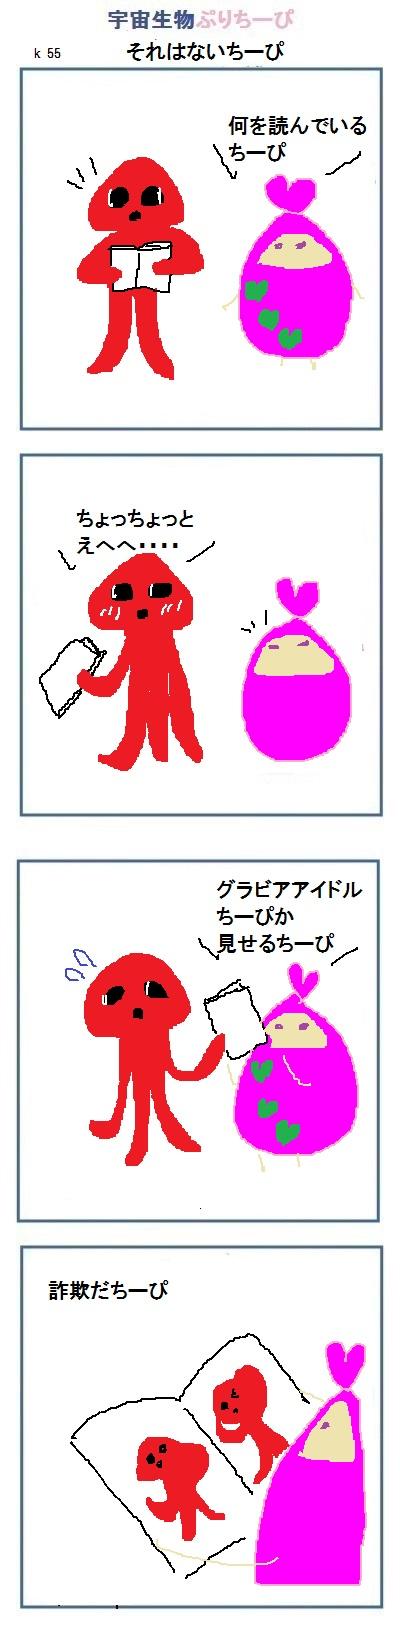 160728_kinsei55.jpg